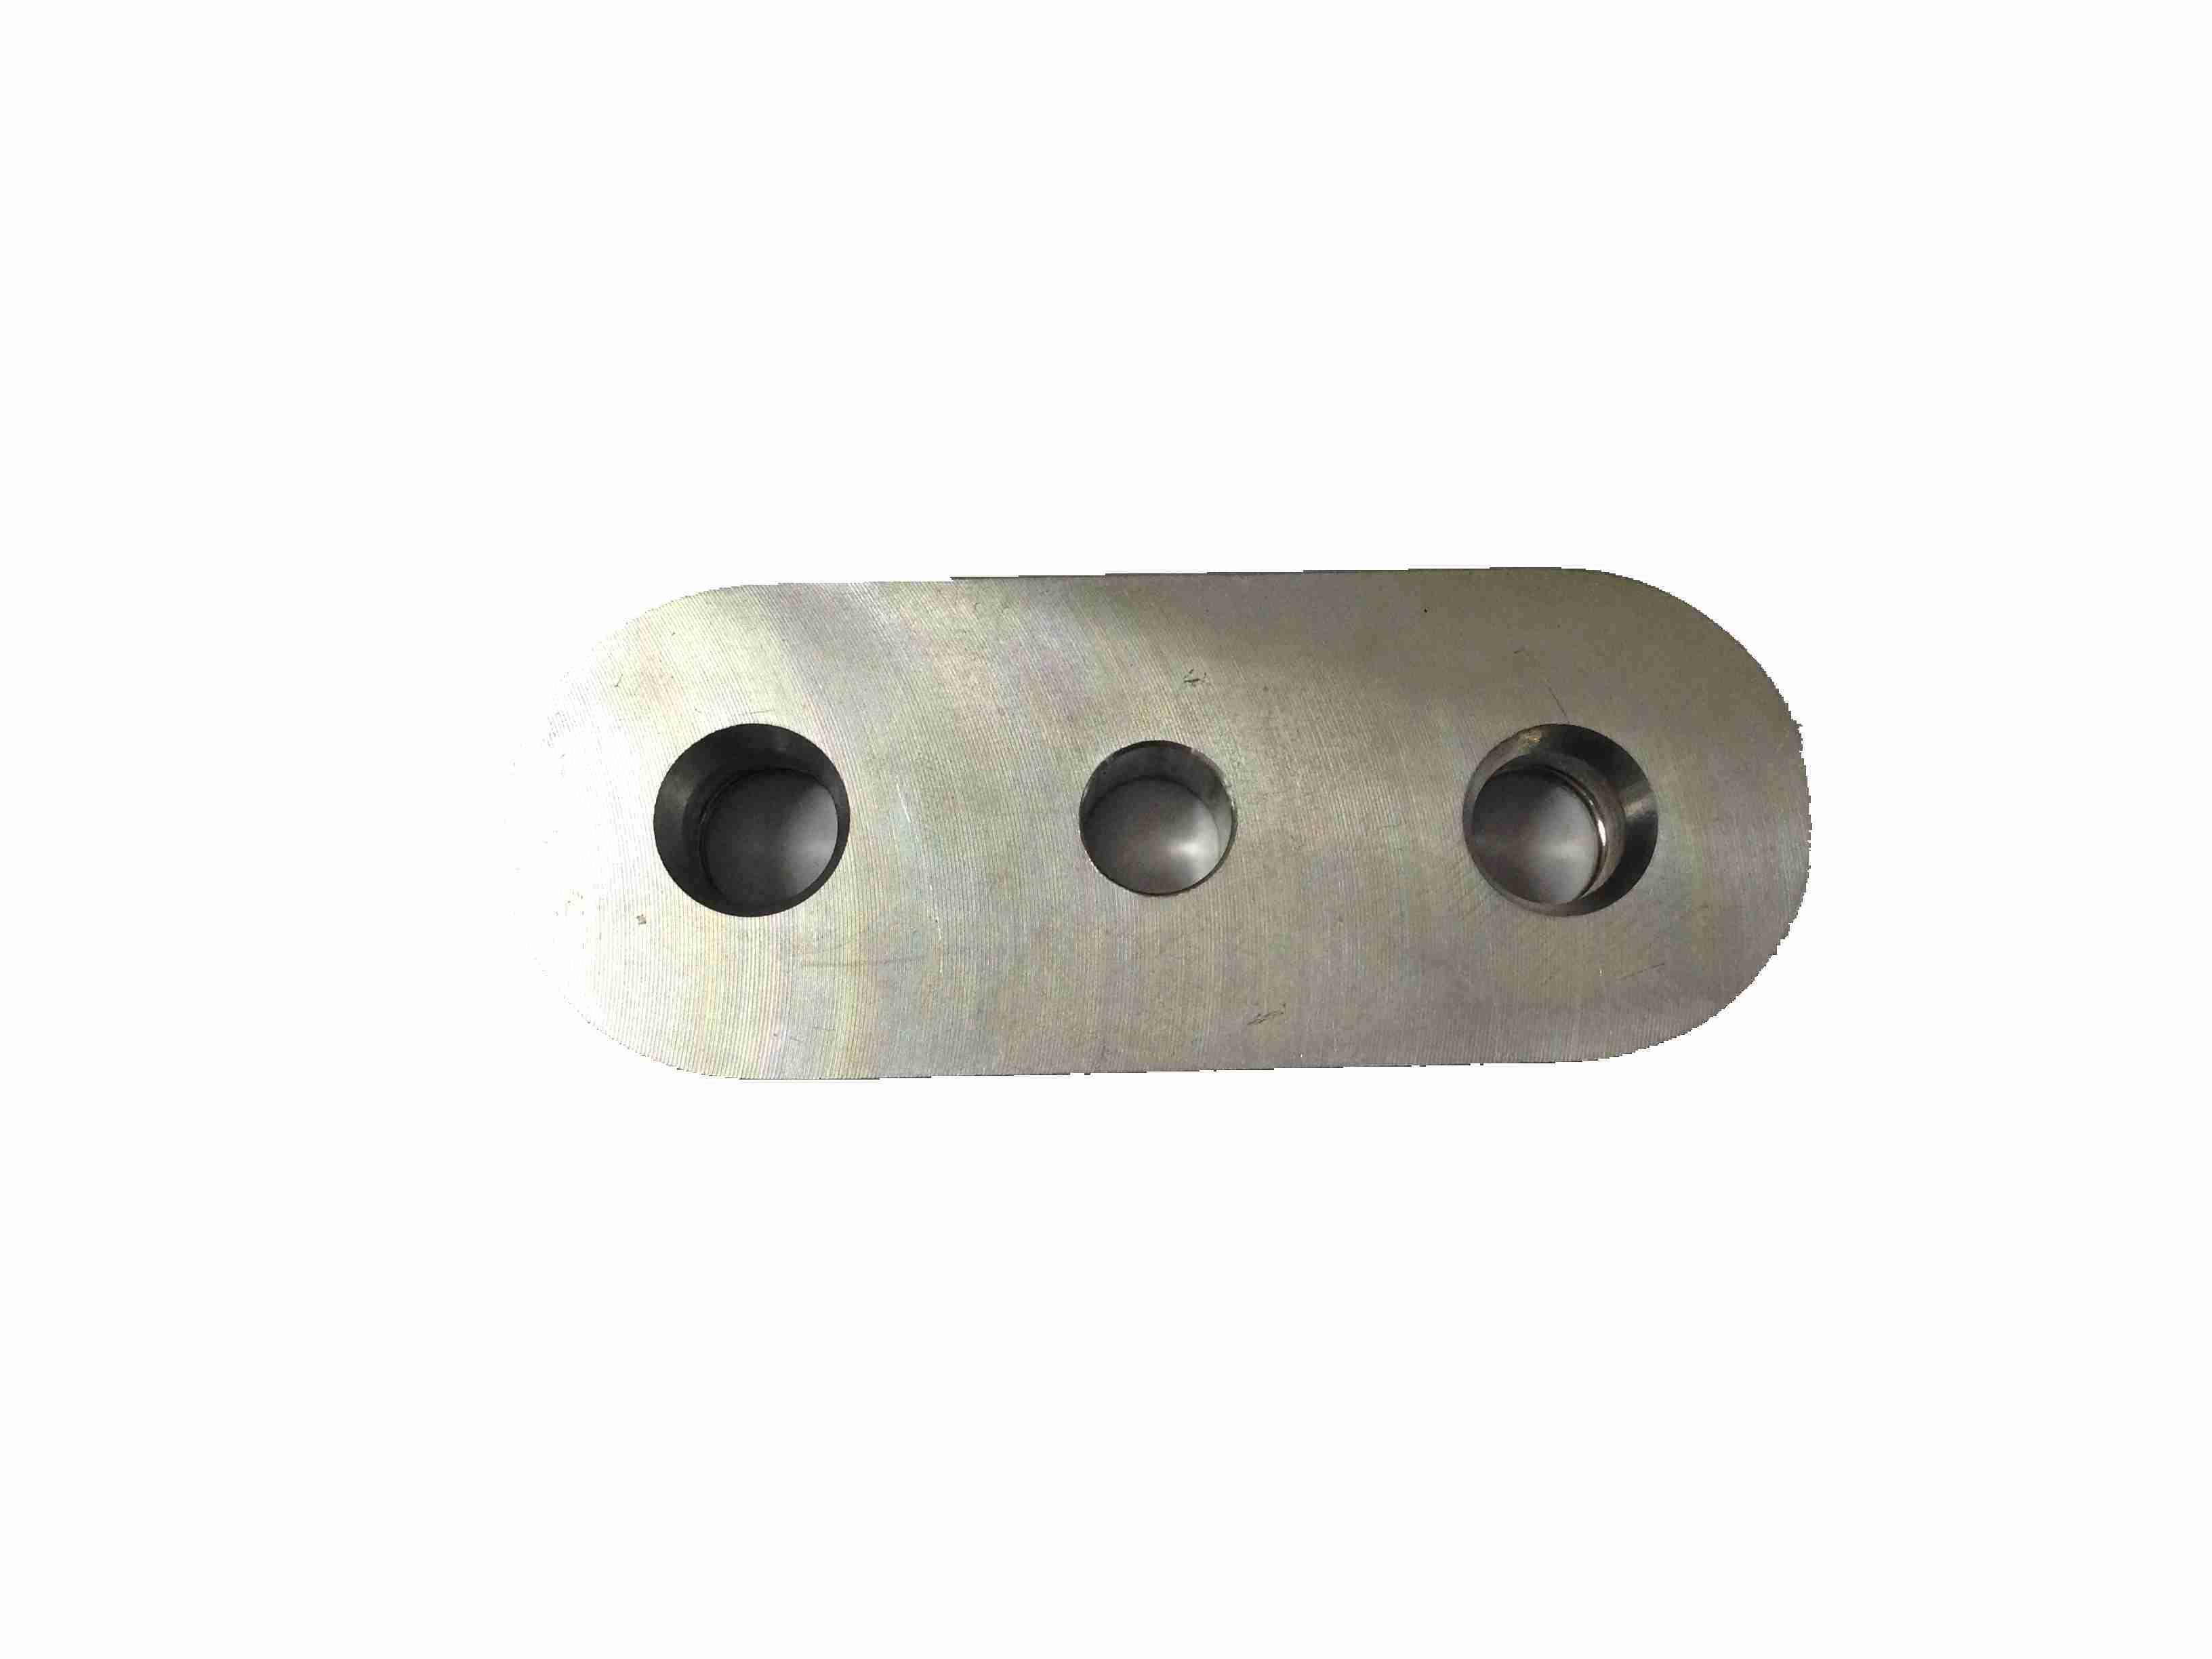 CNC Turning Flange with Aluminium Alloy (DR163)